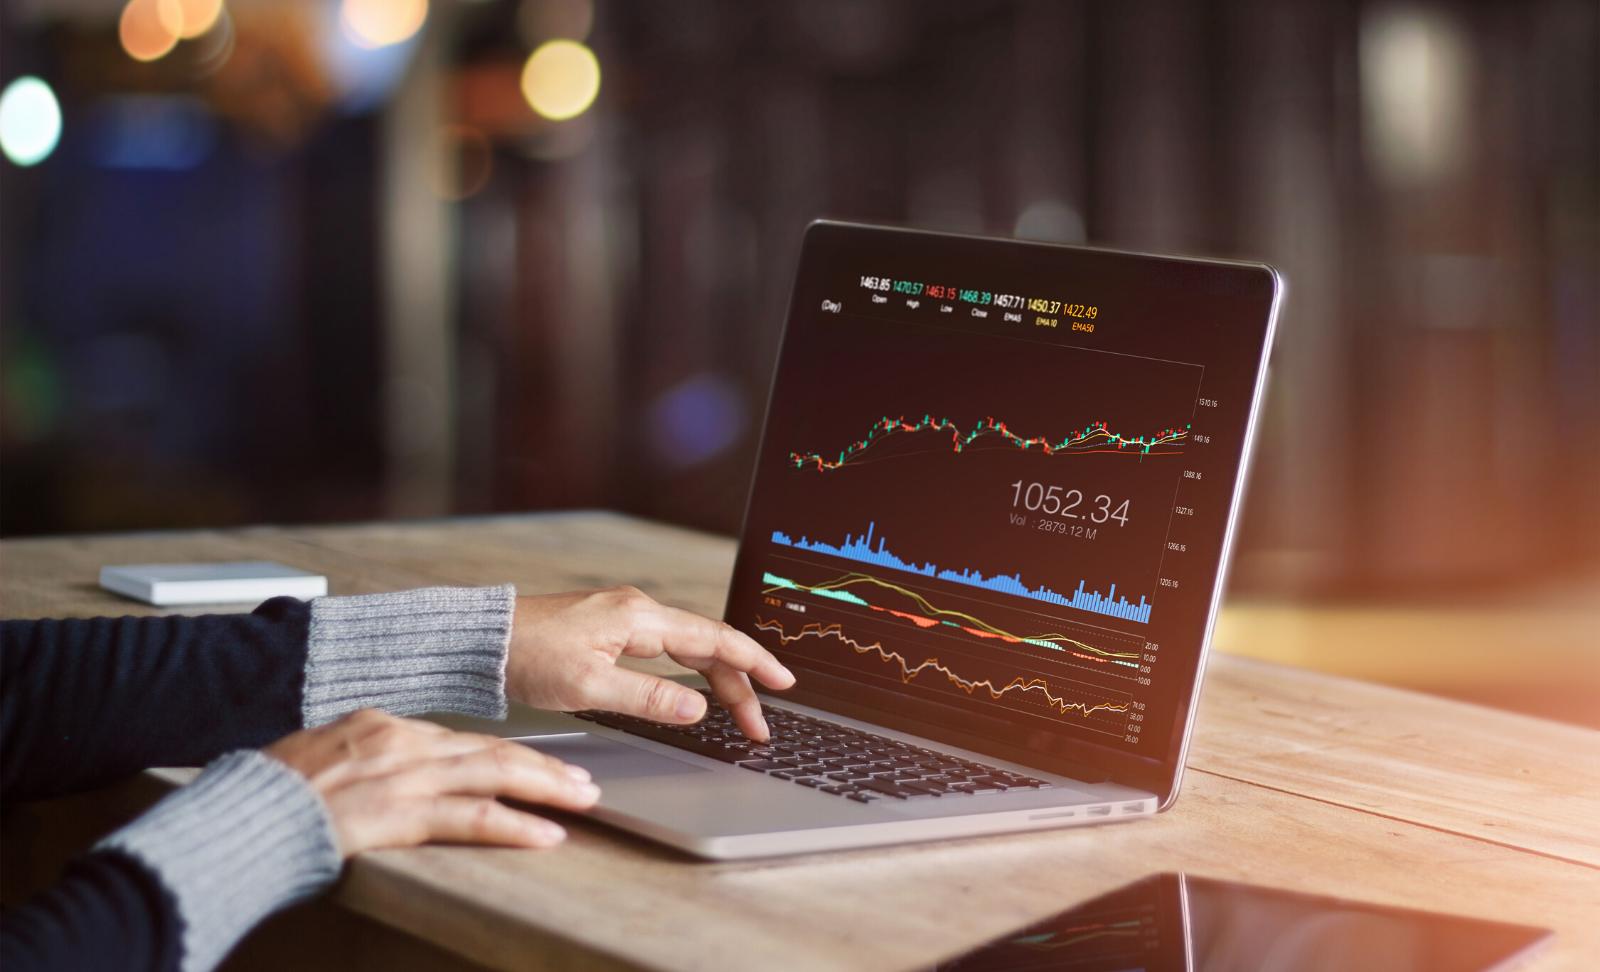 Diplomado en Mercado de Valores (Online)